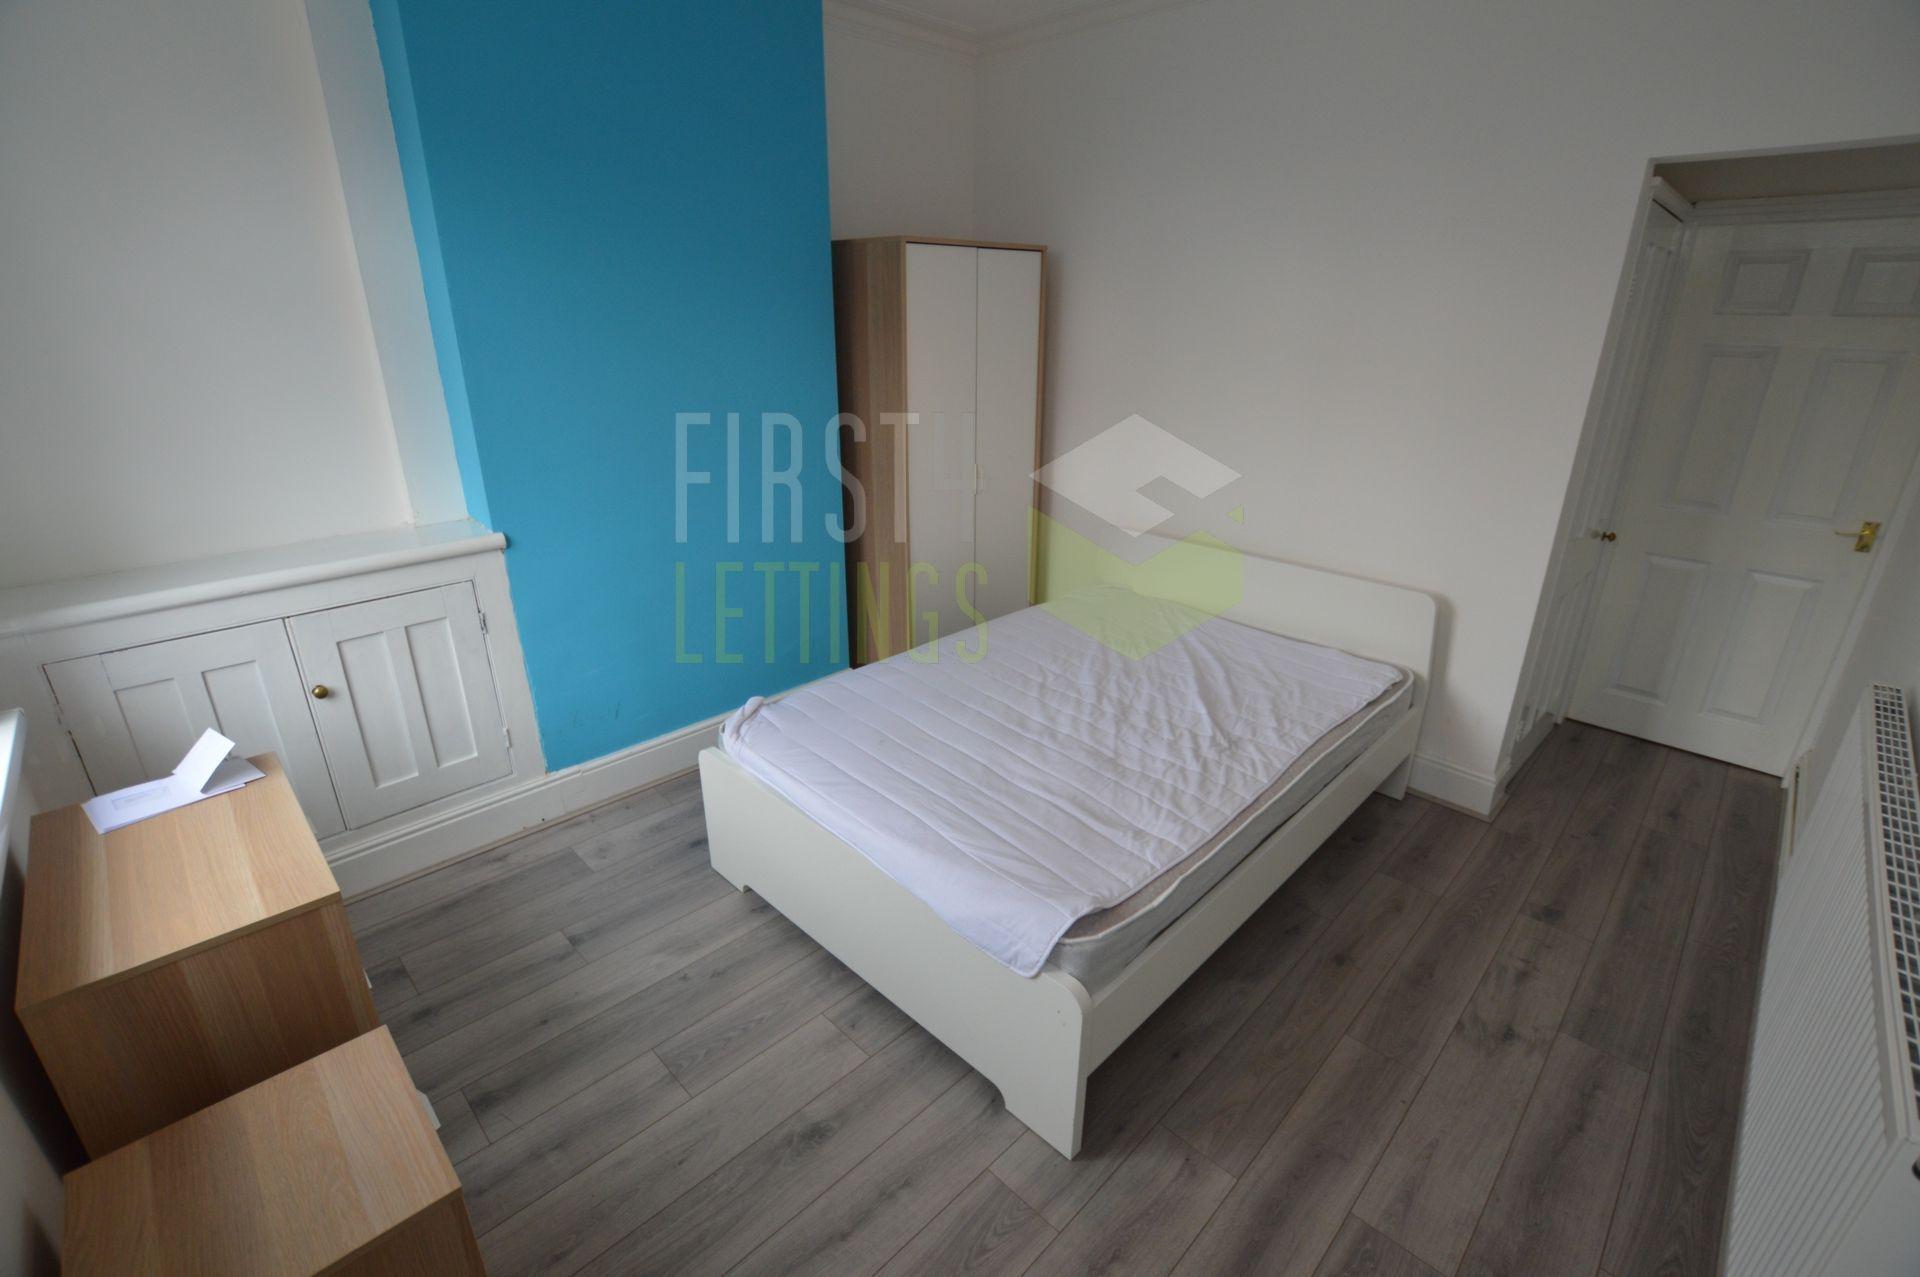 Property photo 1 of 8. Bedroom